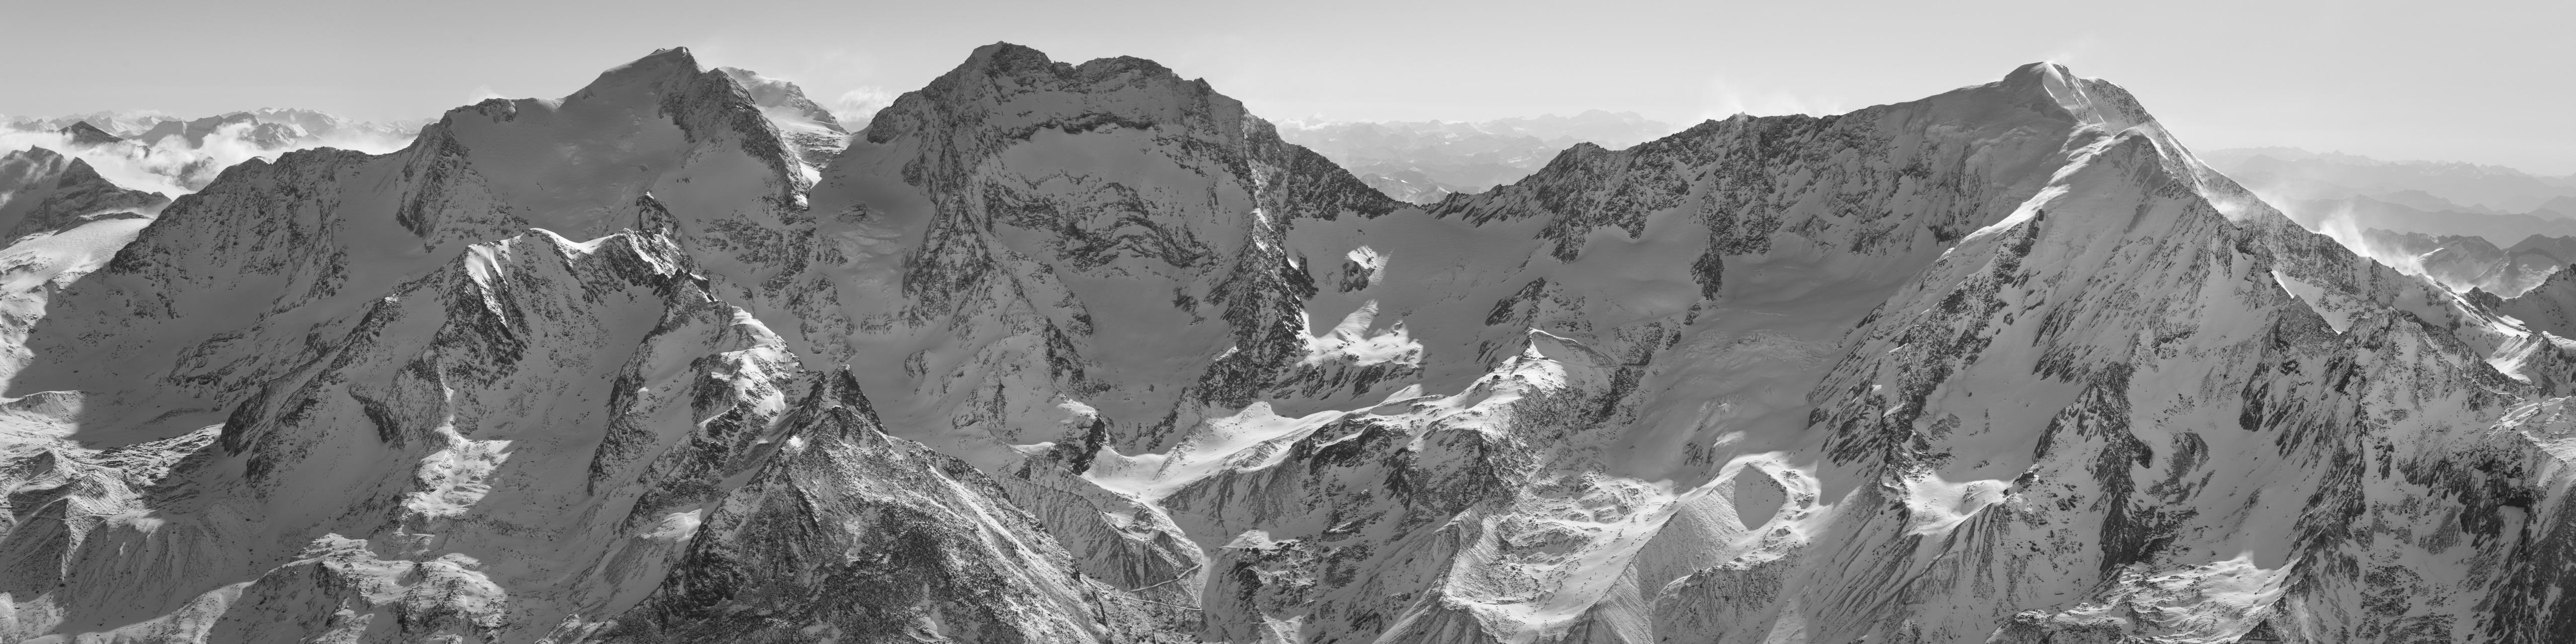 photo panoramique Fletschhorn - Panorama noir et blanc Lagginhorn - Weissmies